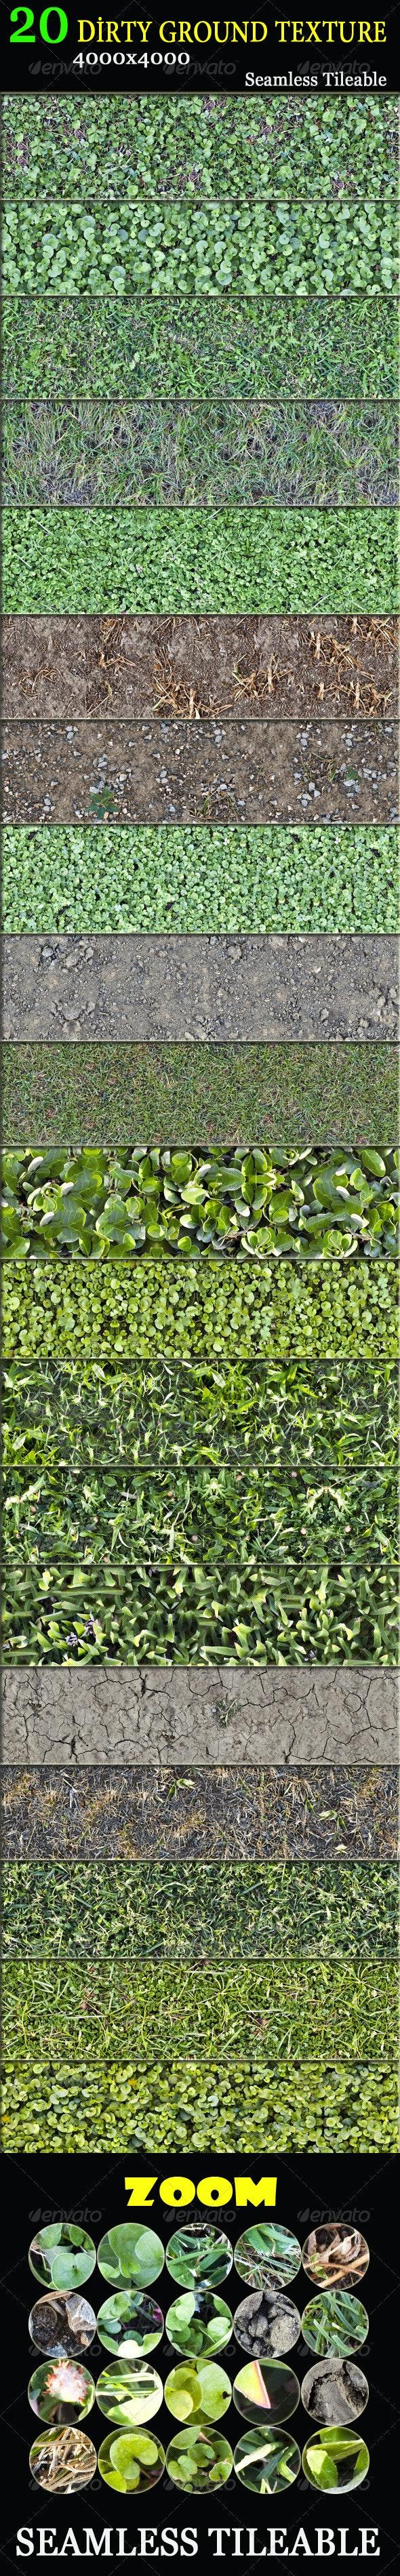 20 Dirty Ground Textures - Nature Textures